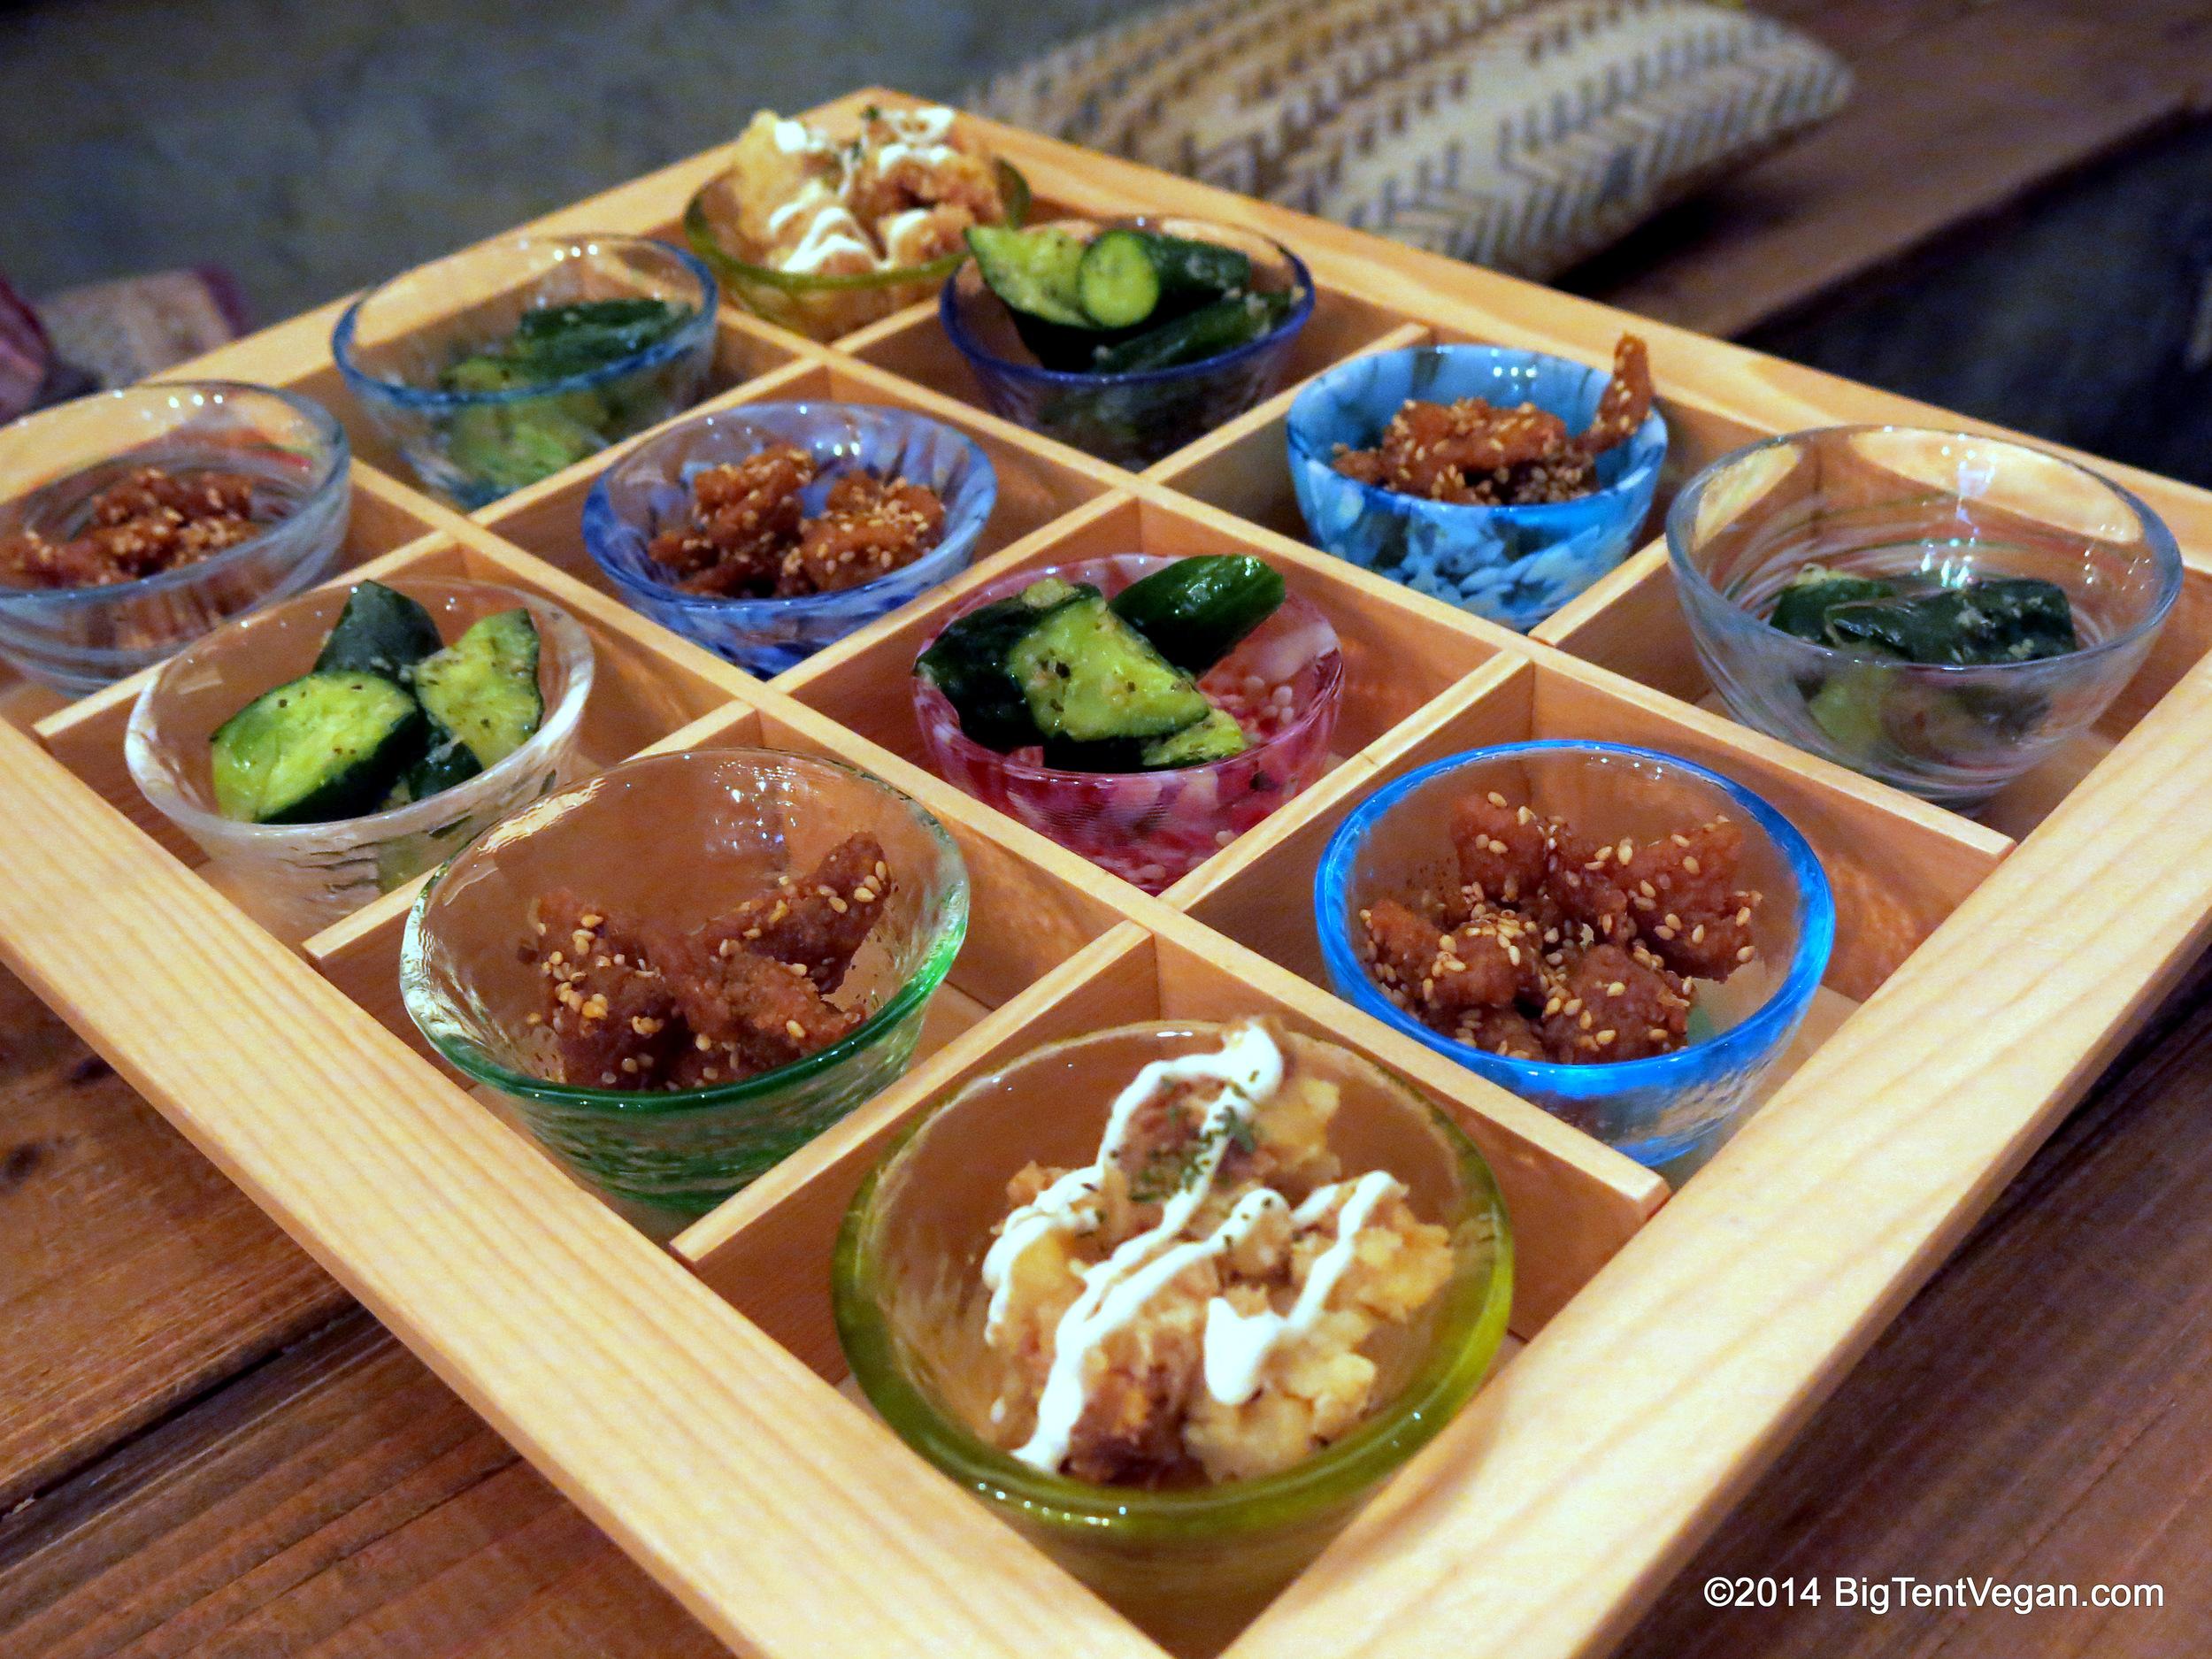 Amuse bouche tray at 100% vegan restaurant Paprika Shokudo in Osaka, Japan